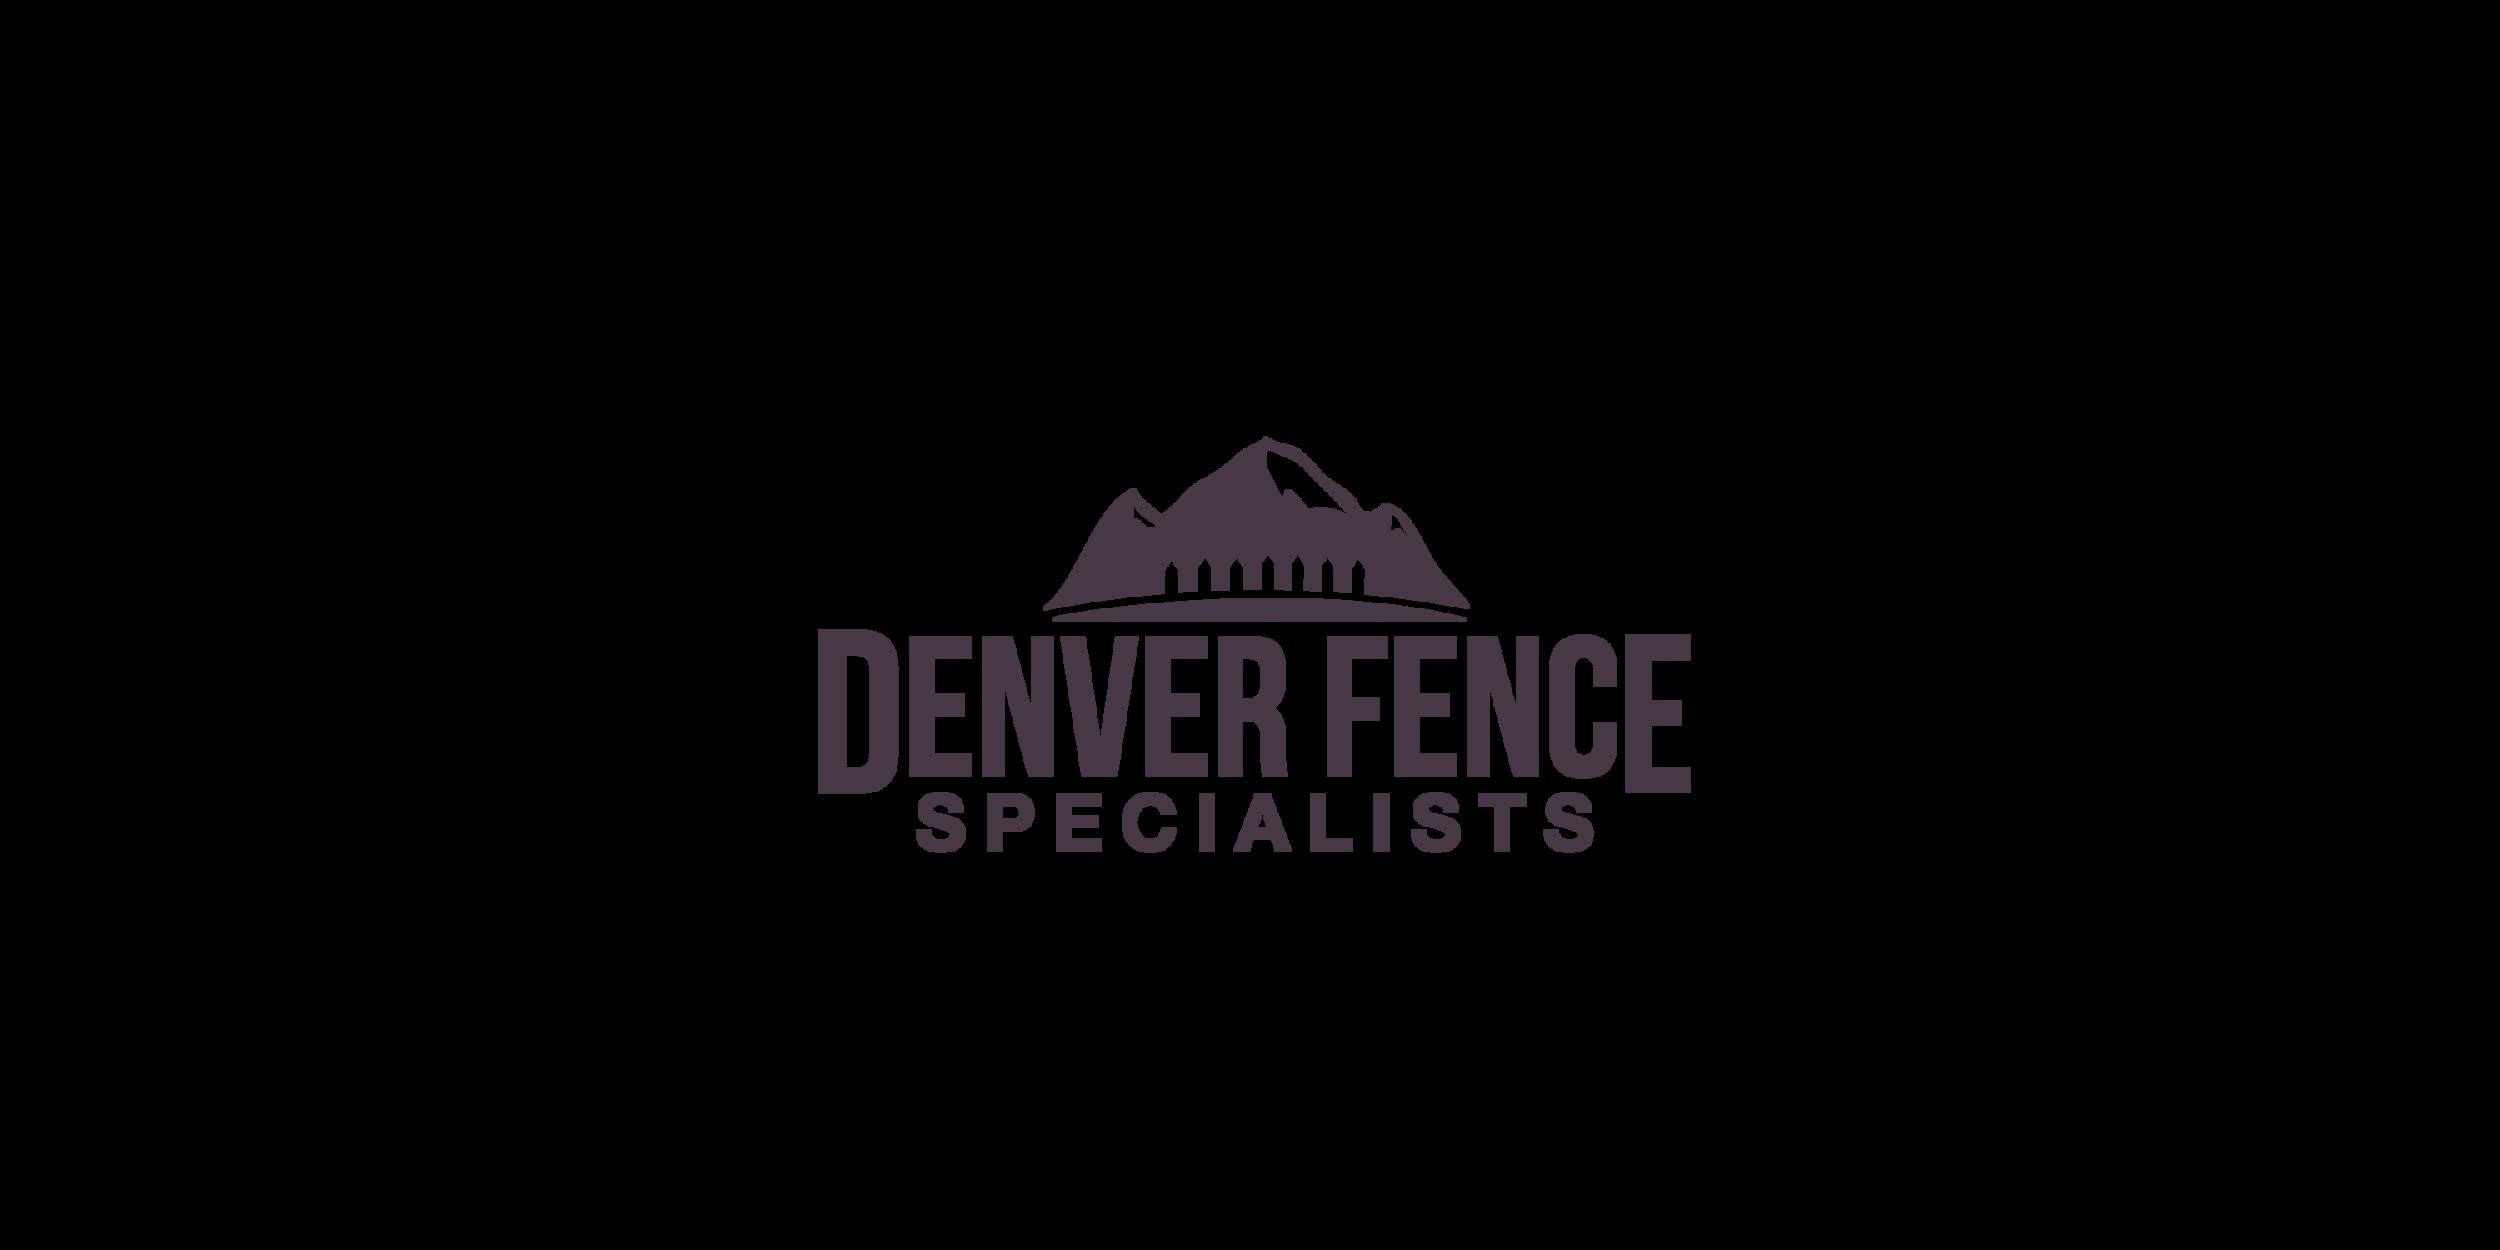 LBD_Carousel_Logo_DenverFence-01.png